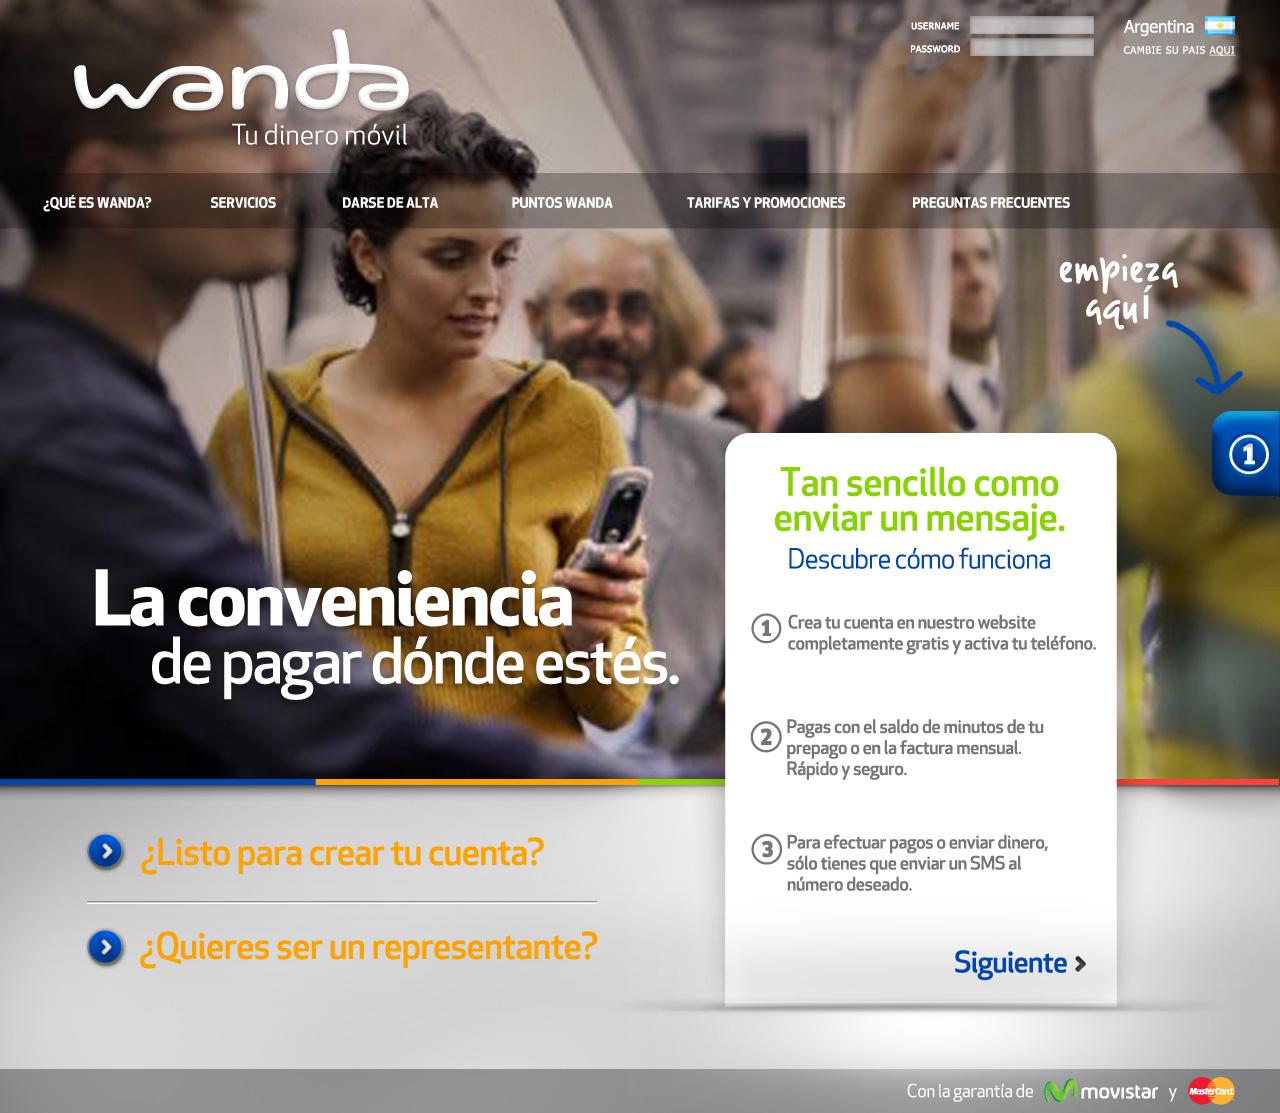 Wanda Argentina Spanish Website